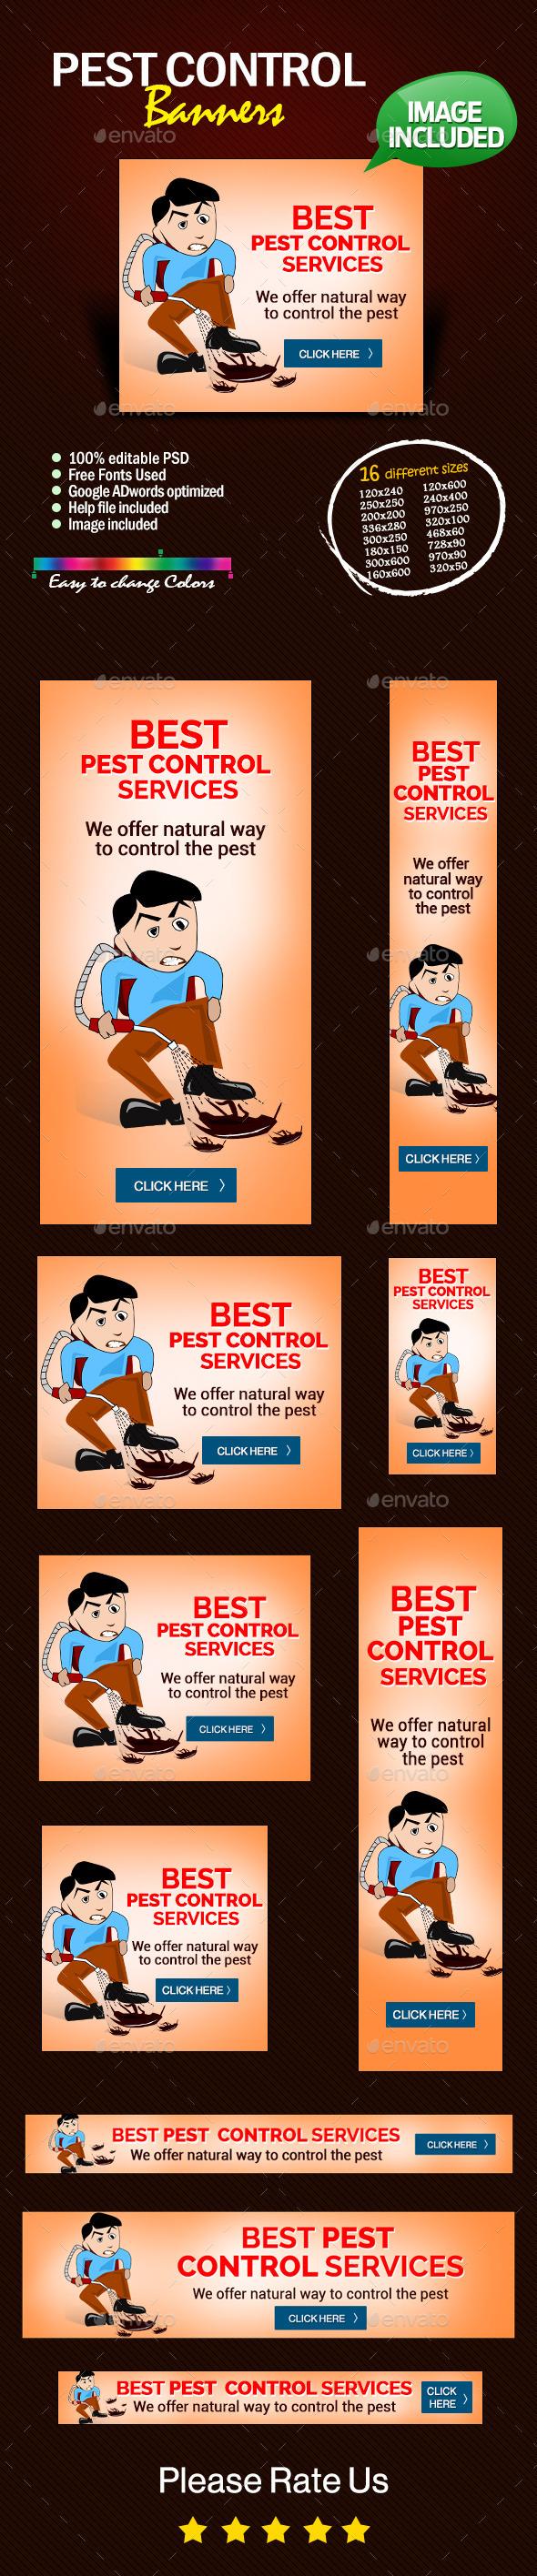 Web Banner Design For Pest Control Service Web Banner Design Banner Design Web Banner